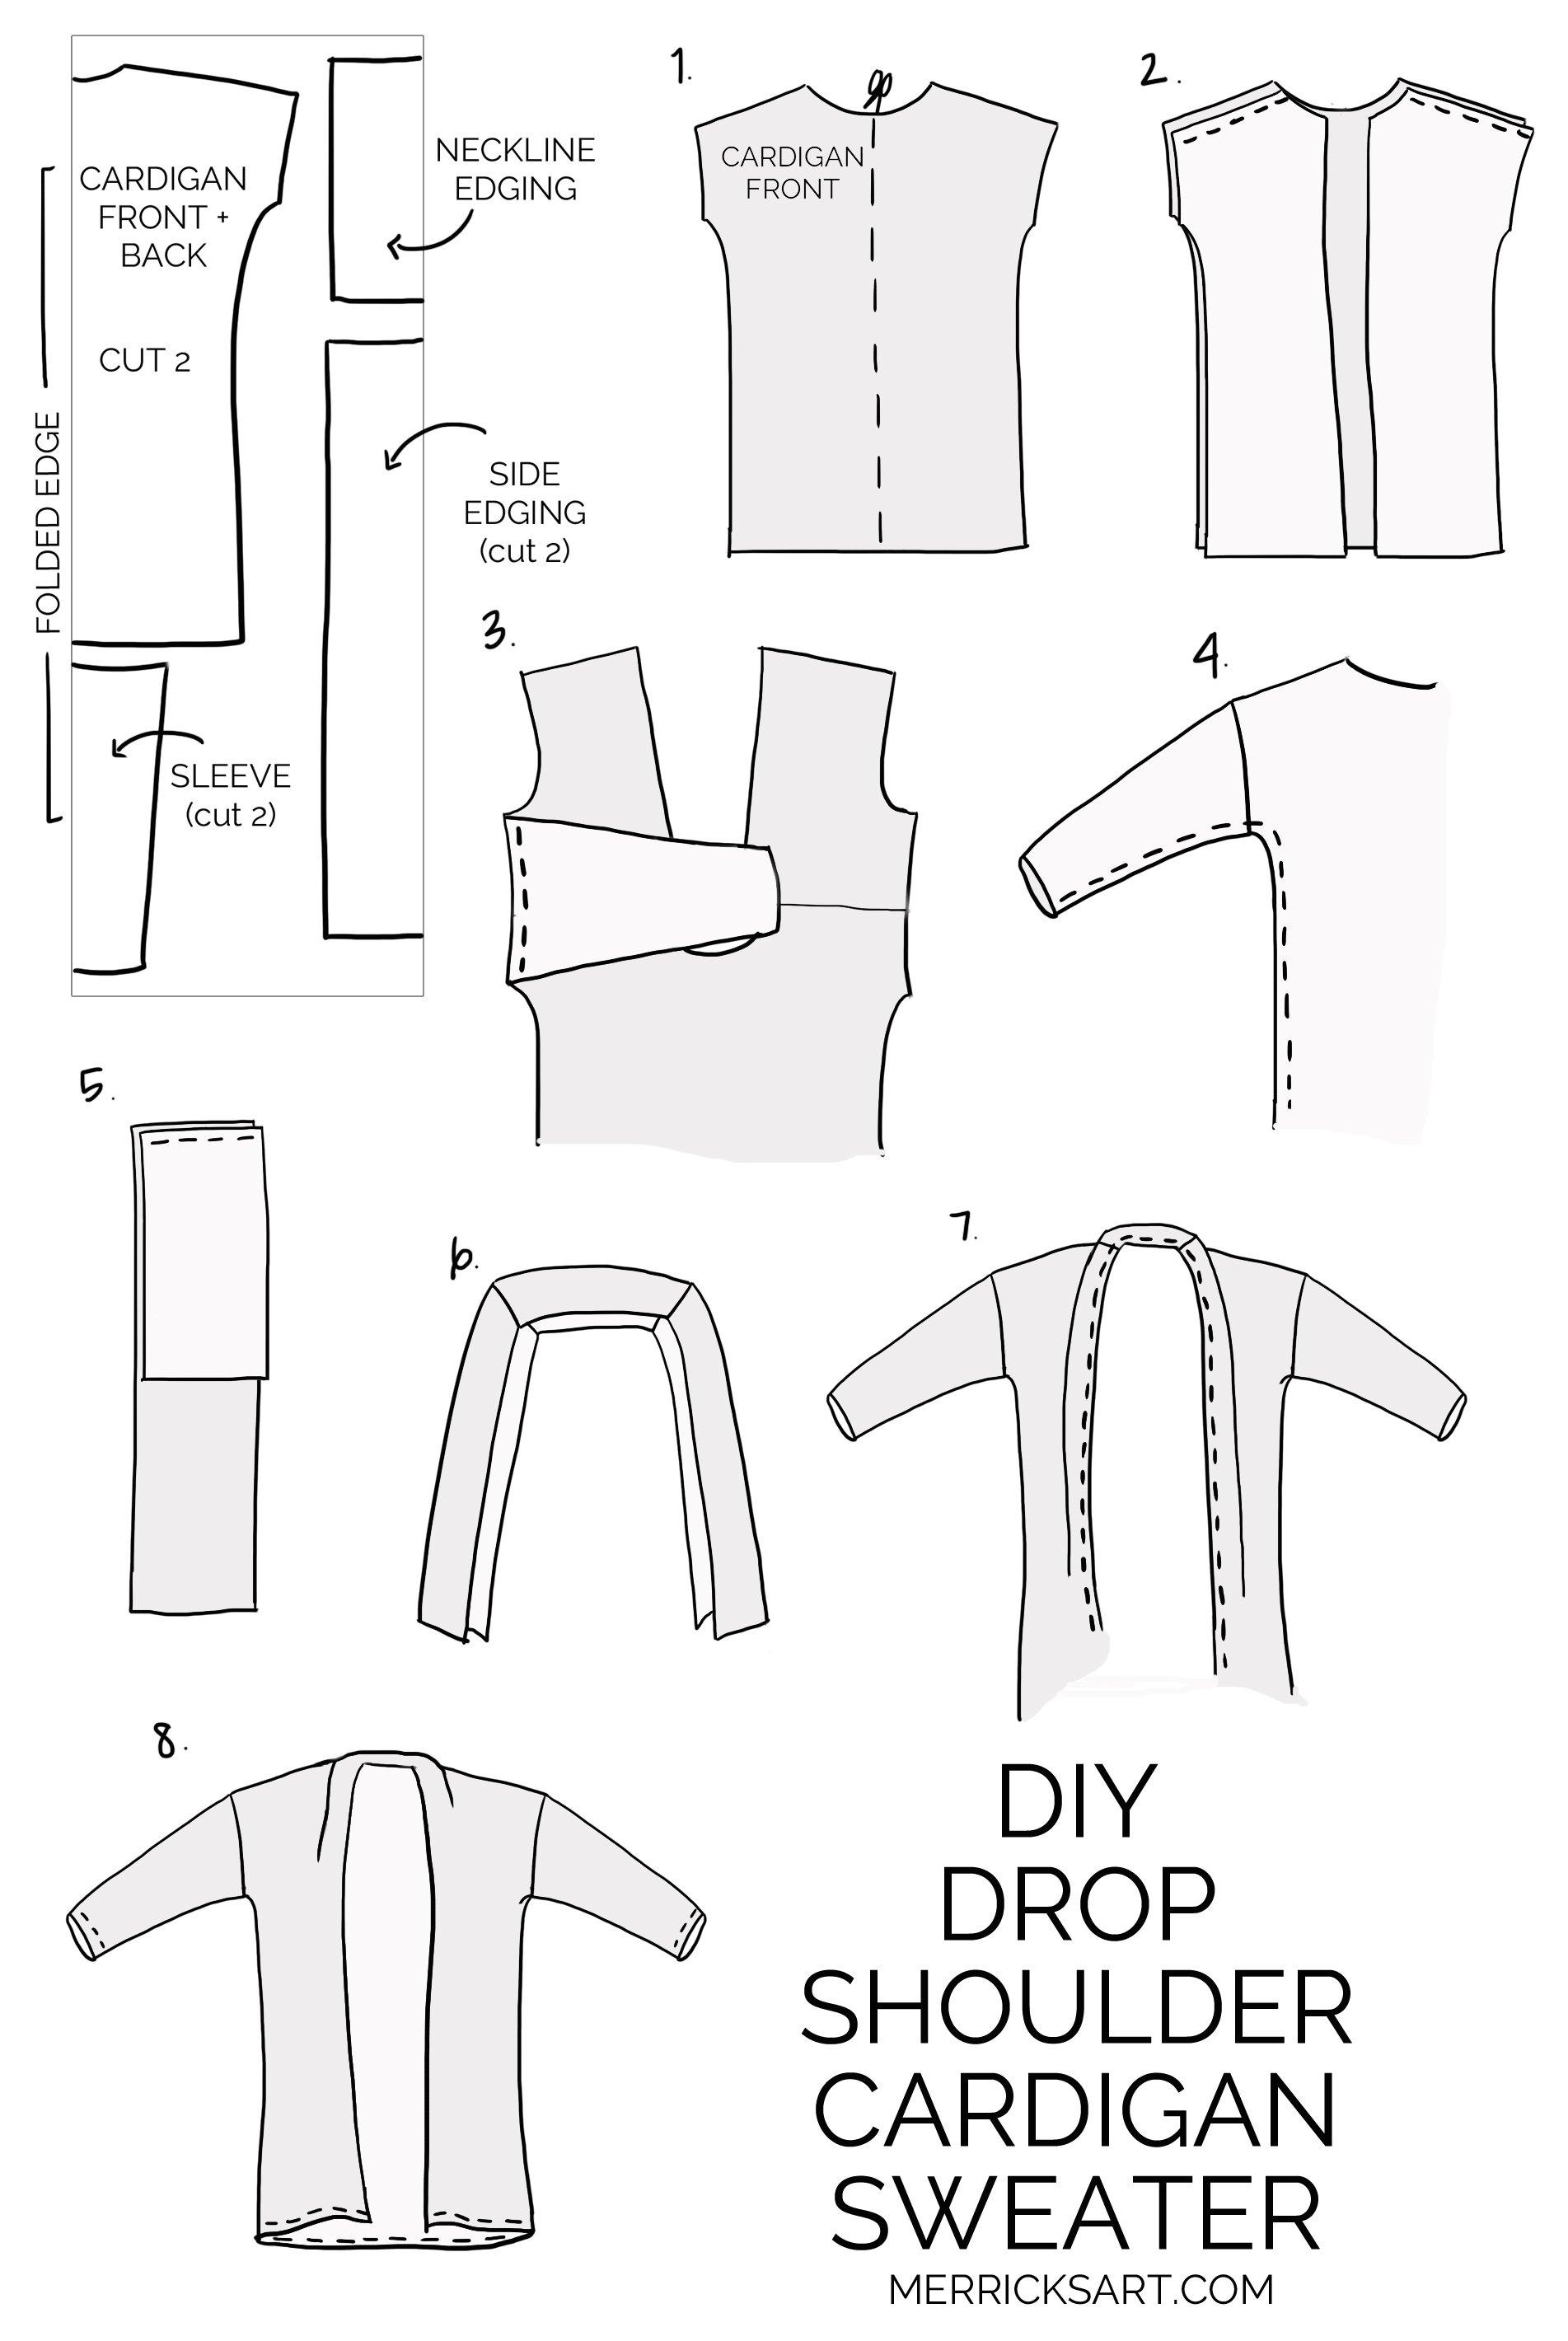 DIY Cardigan Sweater